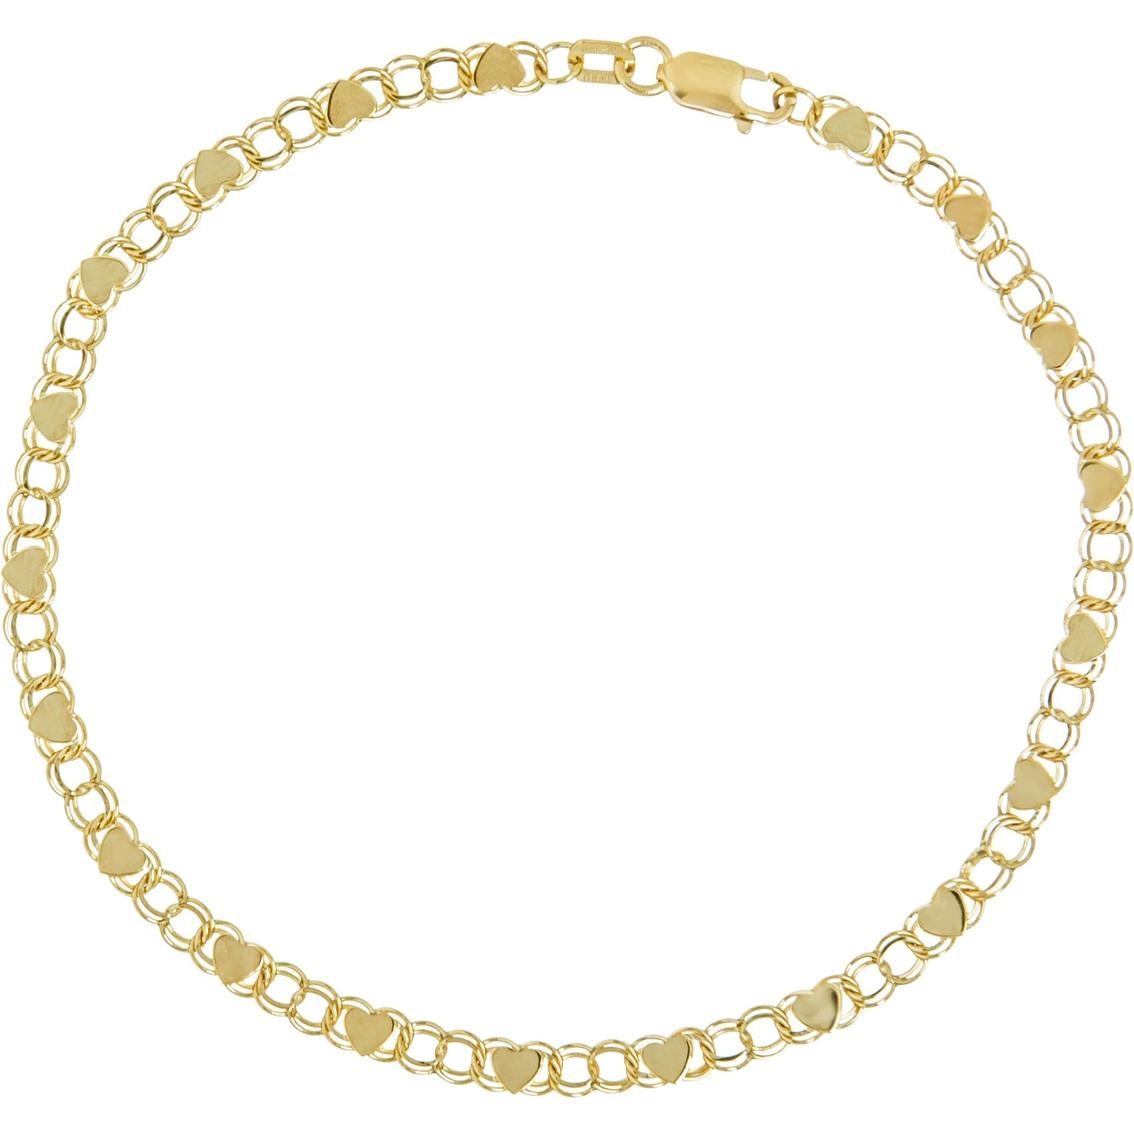 14K Yellow Gold Heart Mirror Rope Bracelet | Gold Bracelets Intended For Gold Heart Mirror (View 15 of 20)